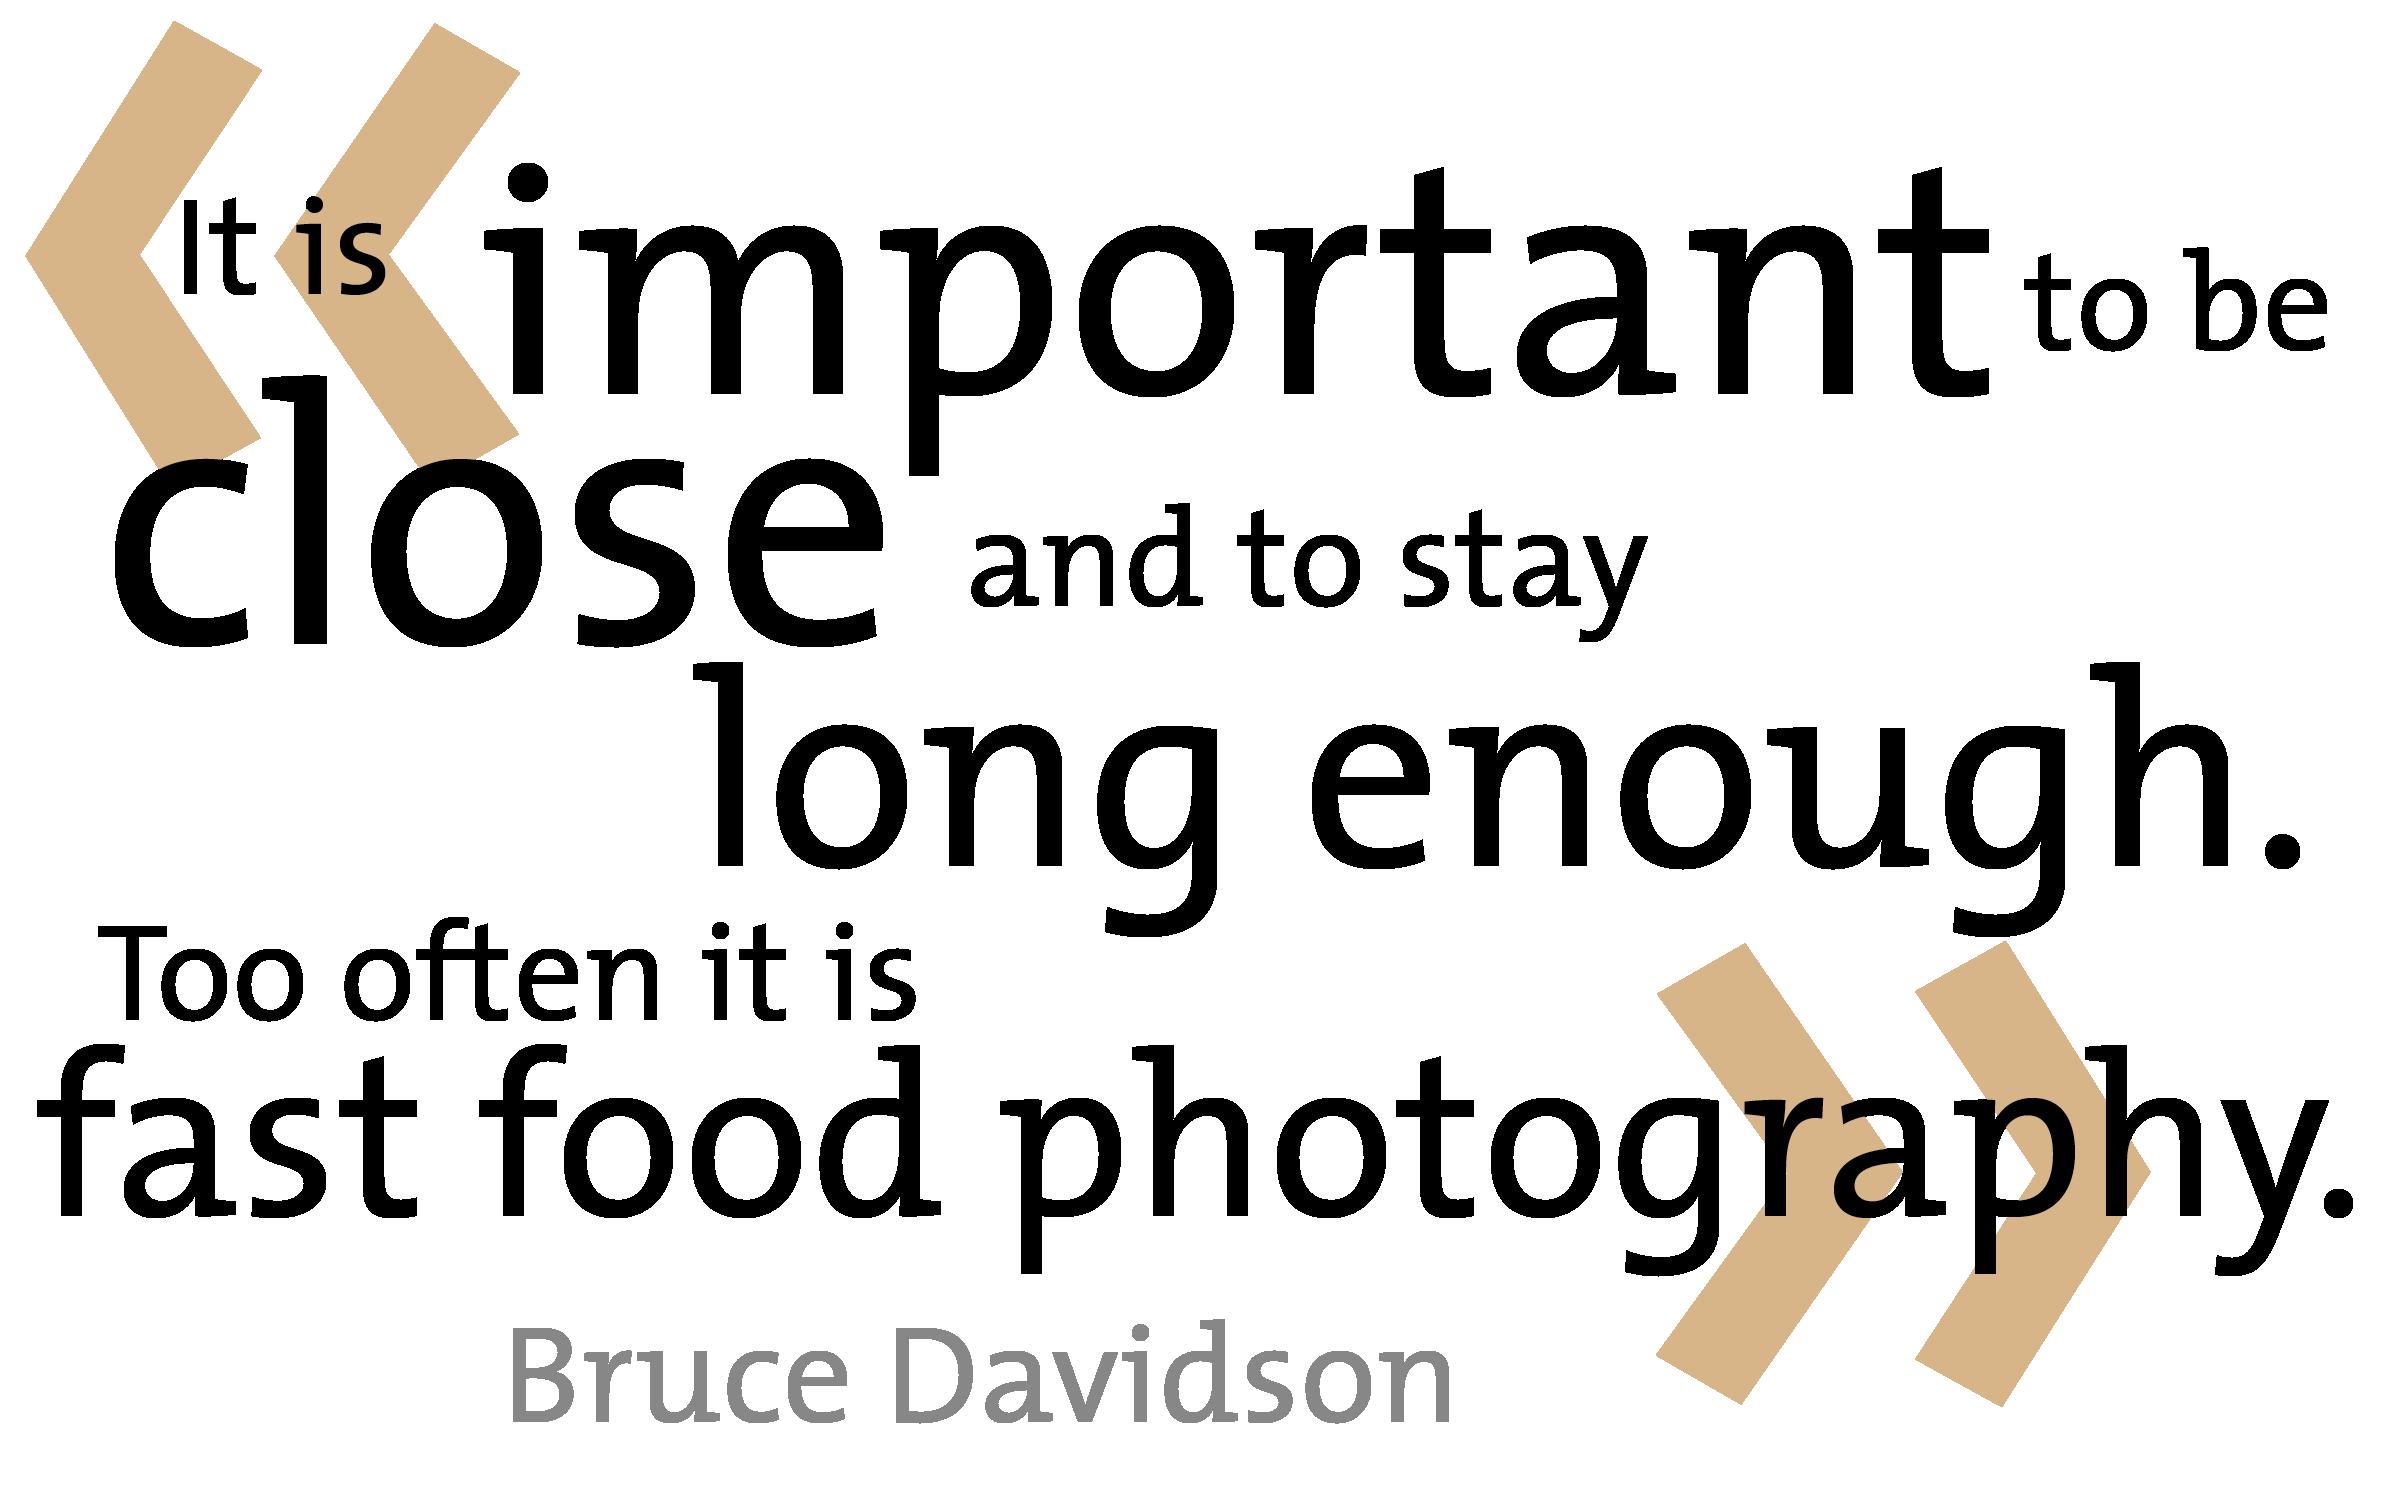 zitate_fotografen_bruce-davidson.png